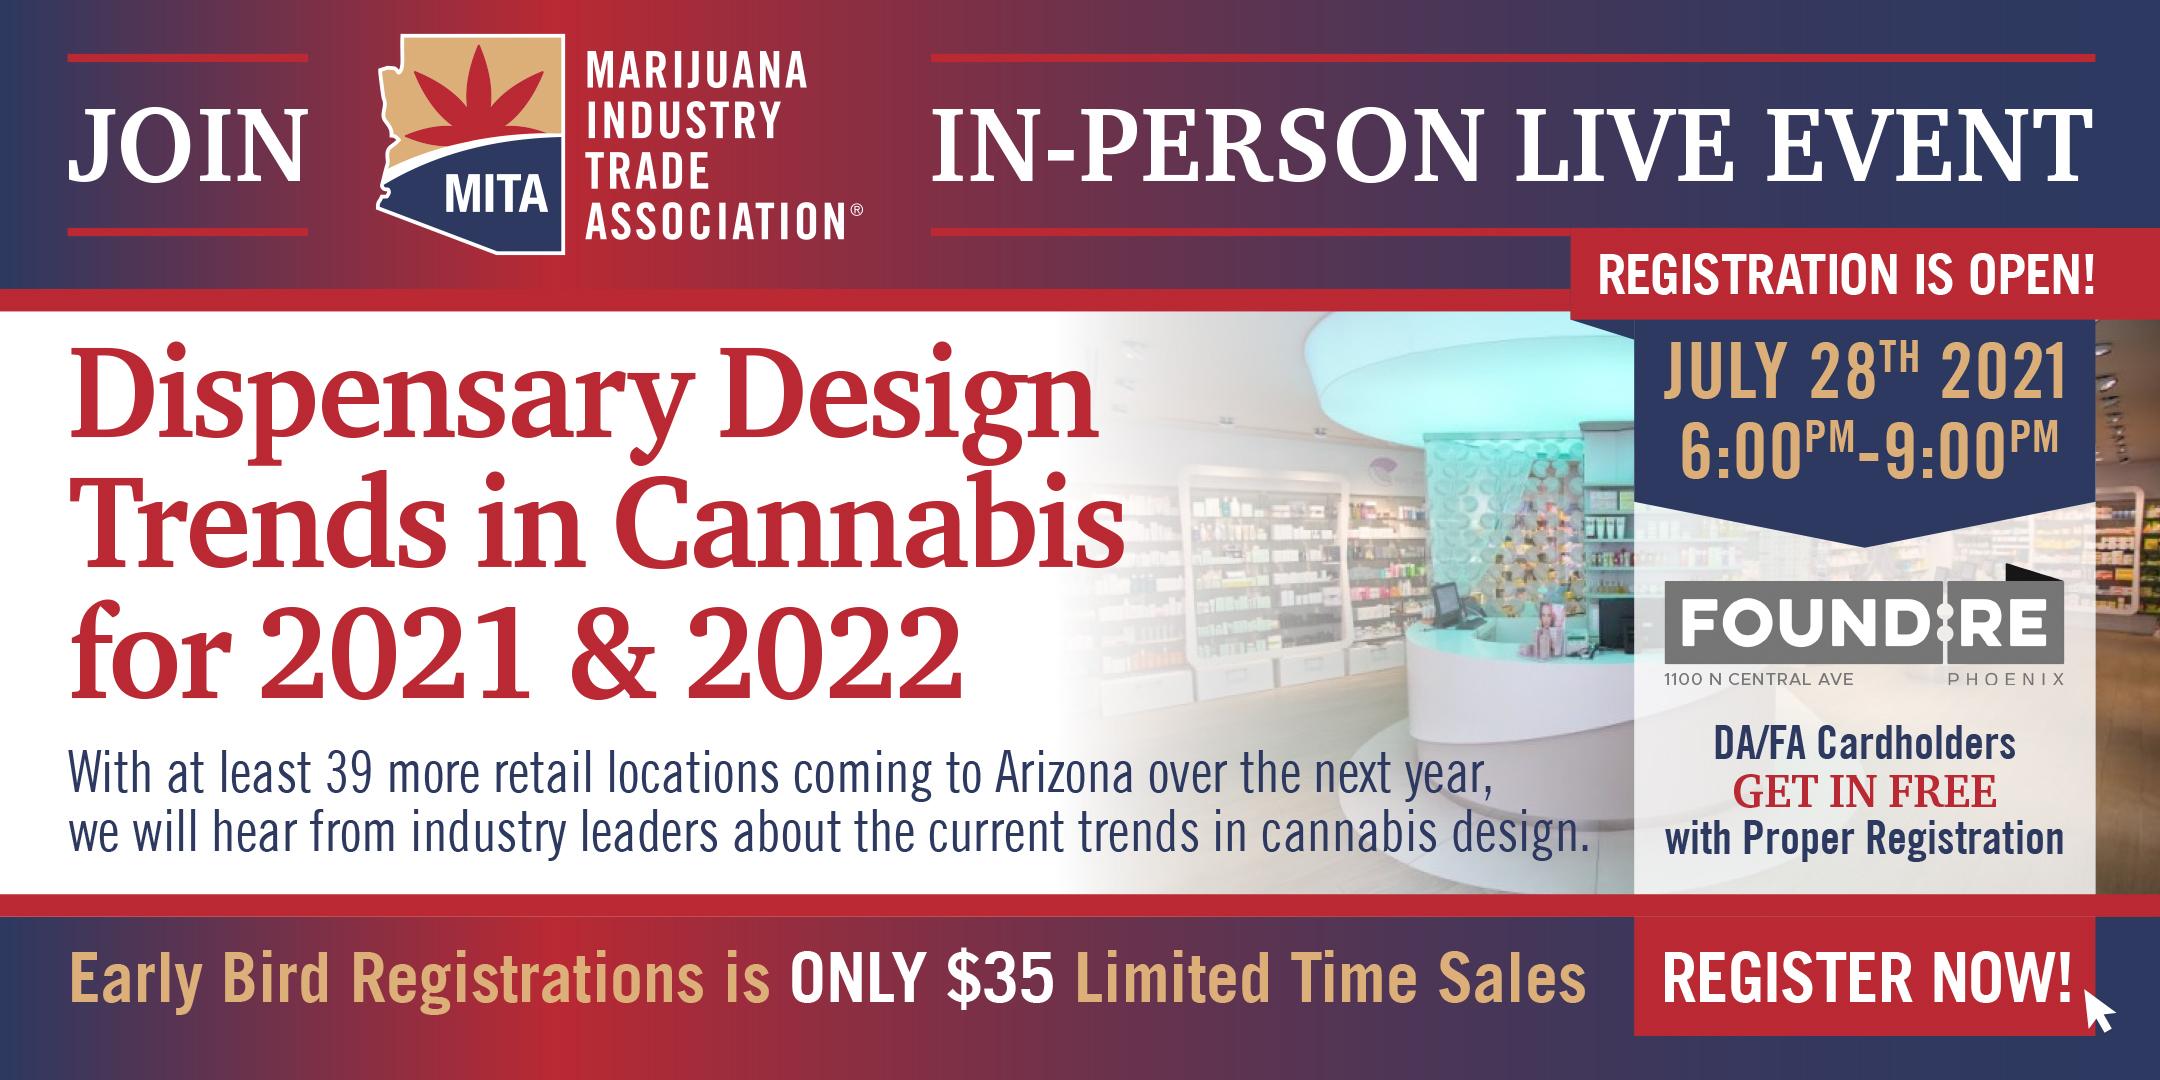 MITA AZ Cannabis Networking : Dispensary Design Trends for 2021 & 2022